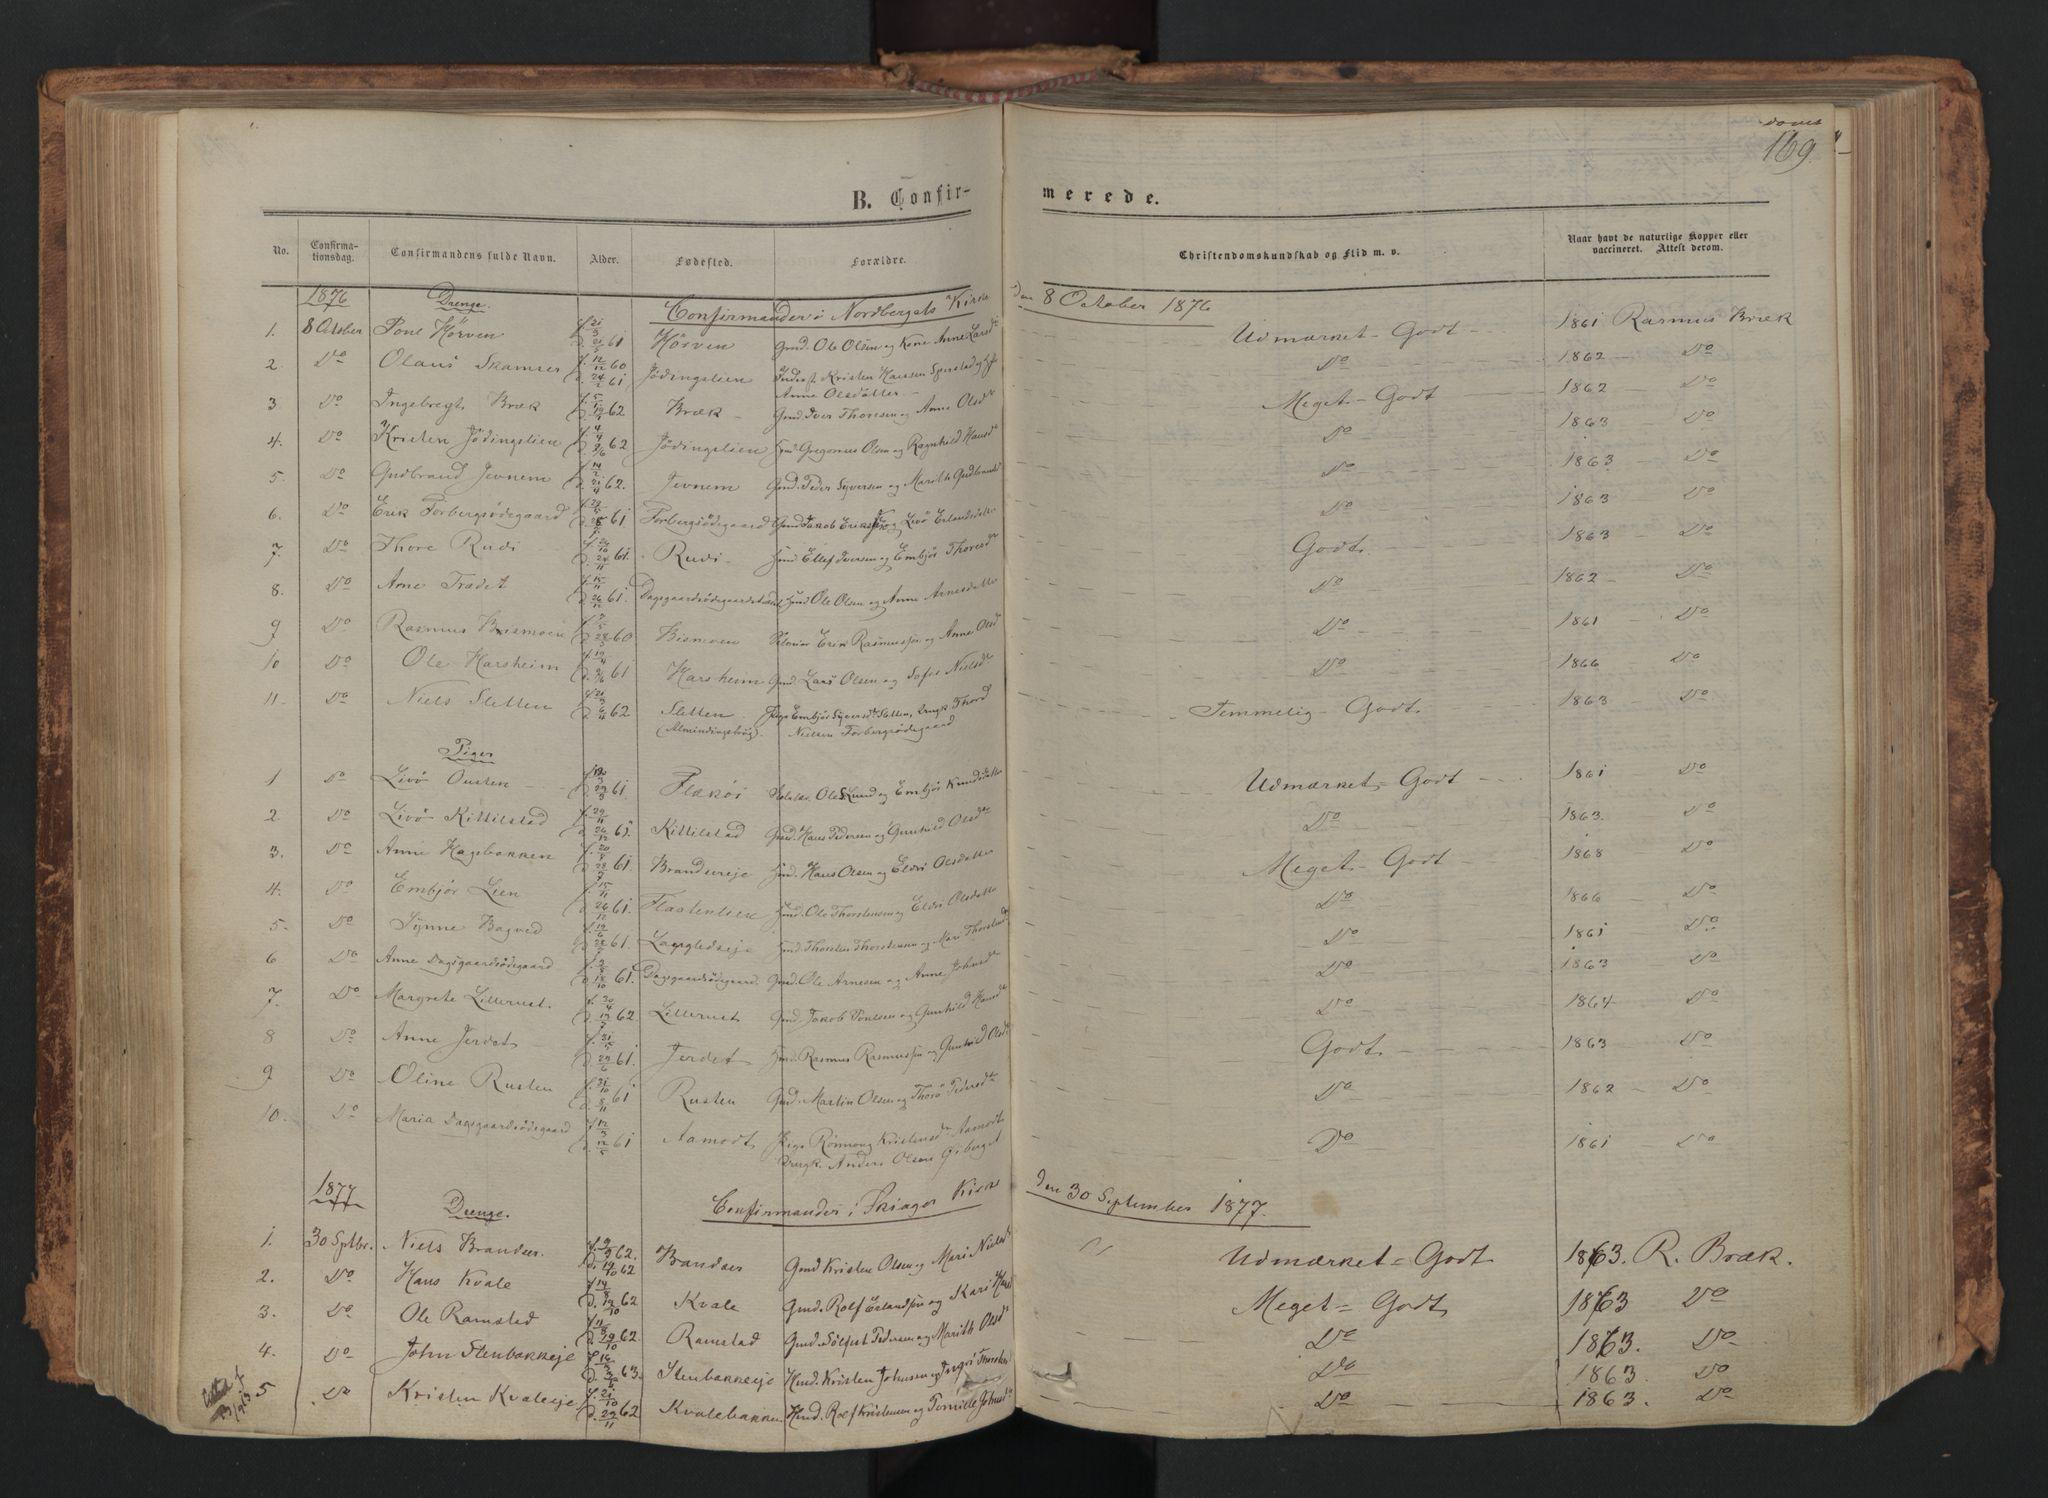 SAH, Skjåk prestekontor, Ministerialbok nr. 1, 1863-1879, s. 169